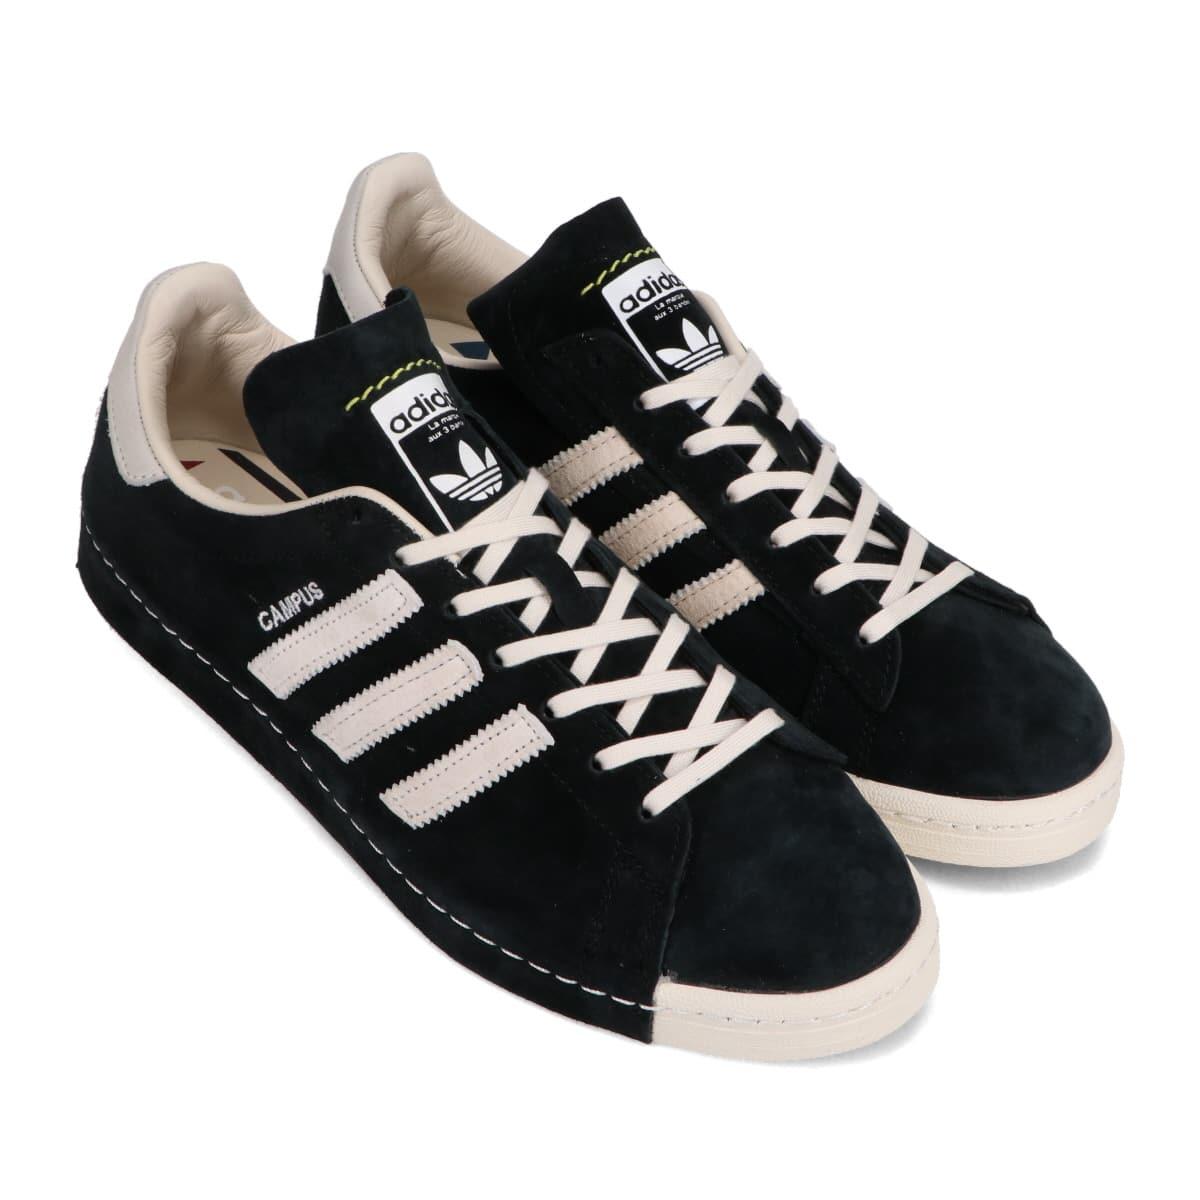 adidas CAMPUS 80S SH CORE BLACK/CHALK WHITE/DARK BLUE 20FW-S_photo_large